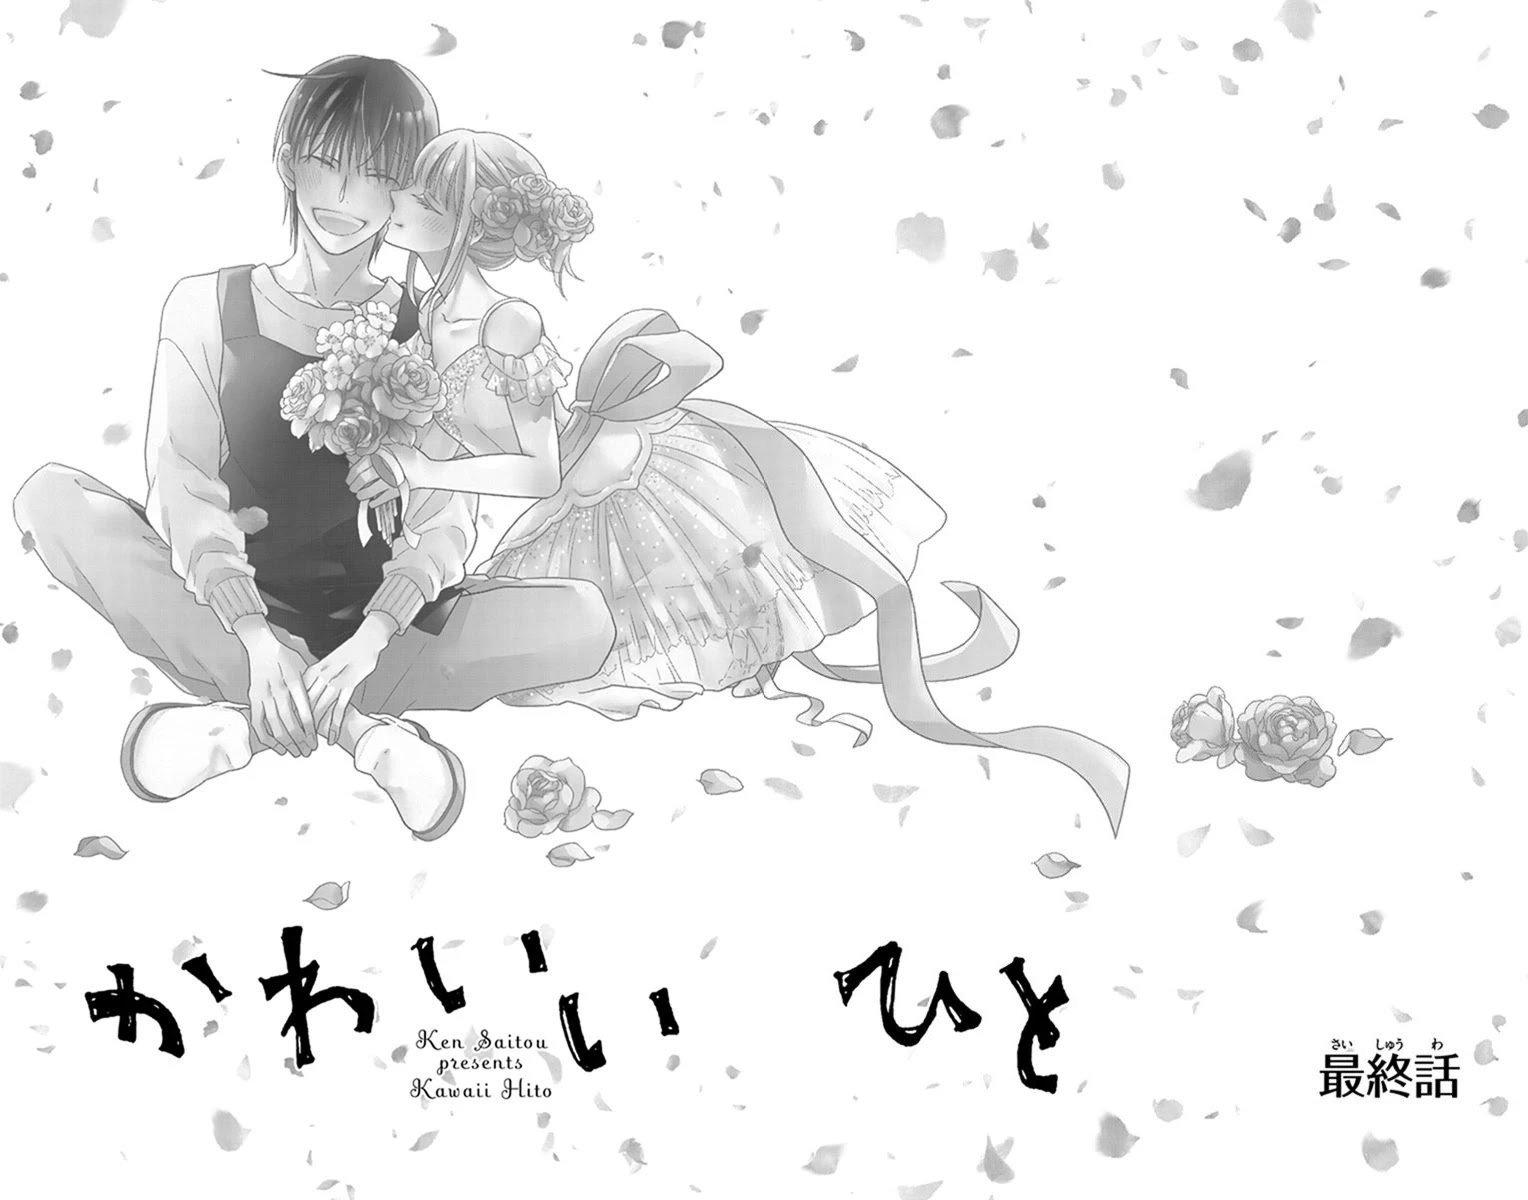 Manga Kawaii Hito (SAITOU Ken) - Chapter 30 Page 4